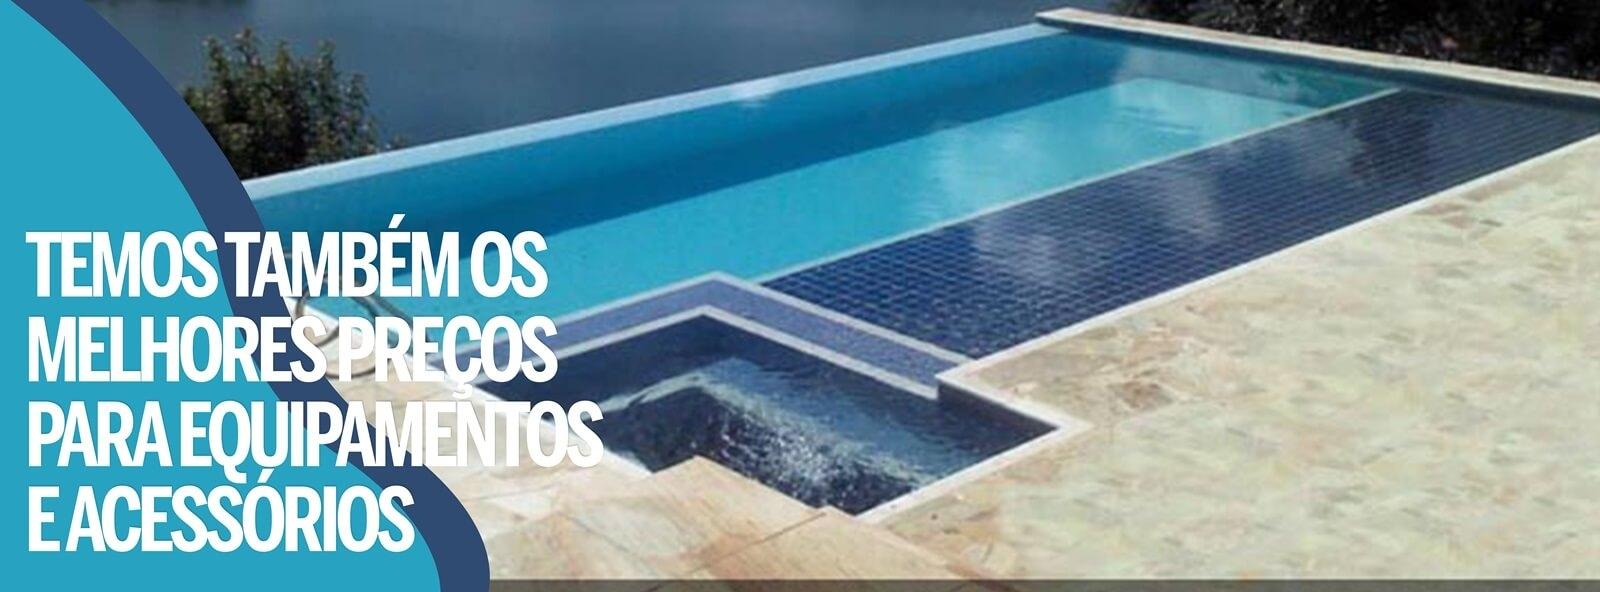 campestrepiscinas-piscina-de-vinil-pequena